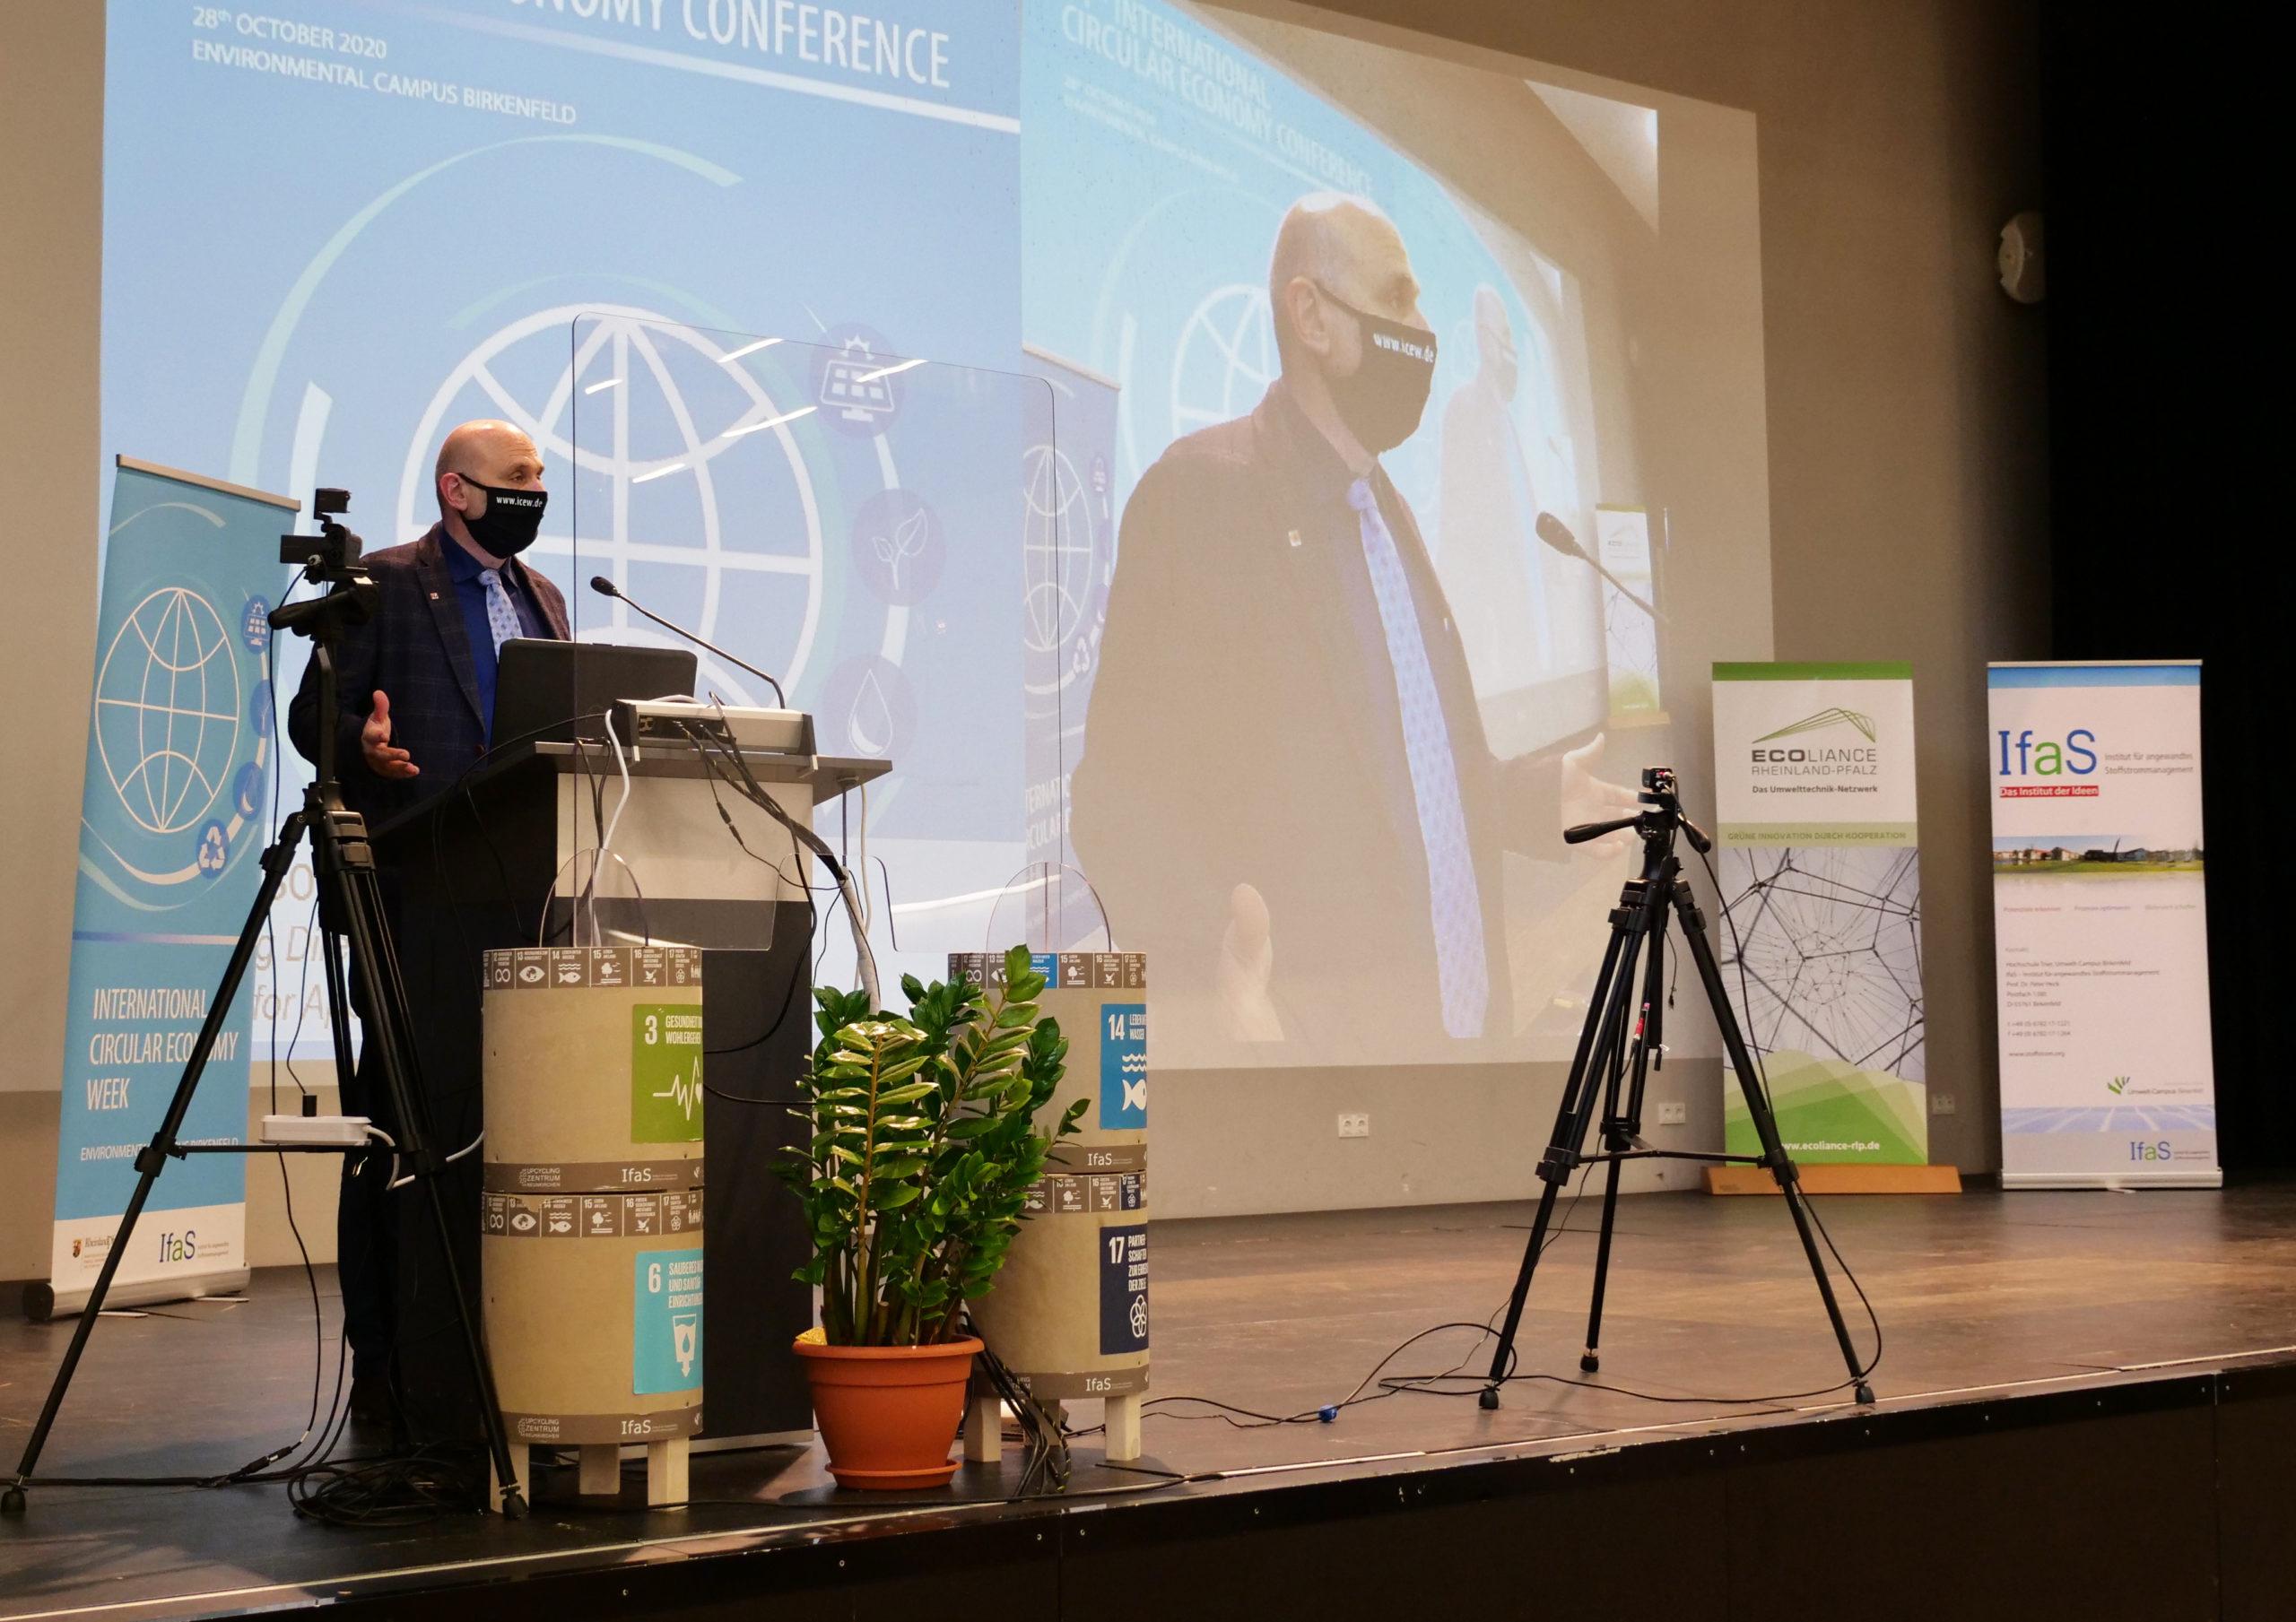 11th International Circular Economy Conference (ICEC) am Umwelt-Campus Birkenfeld